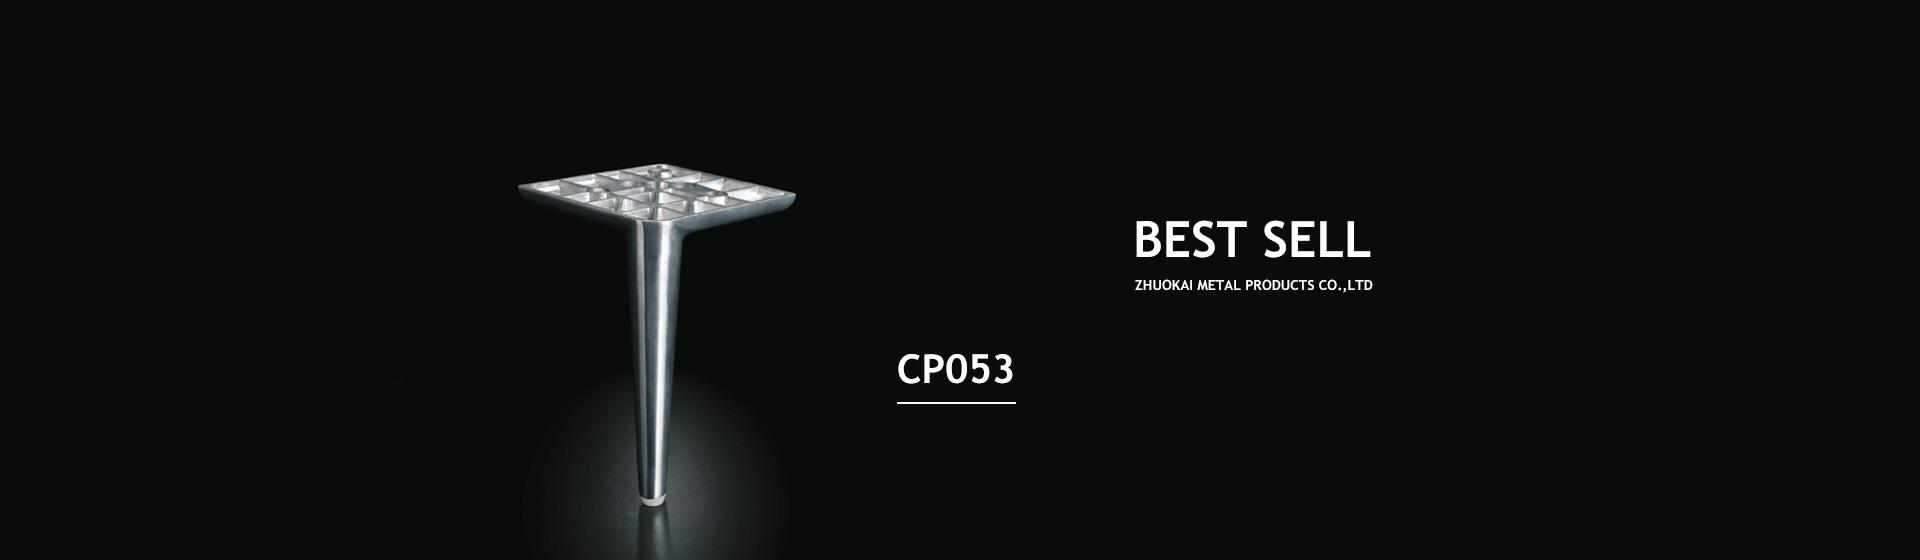 CP053